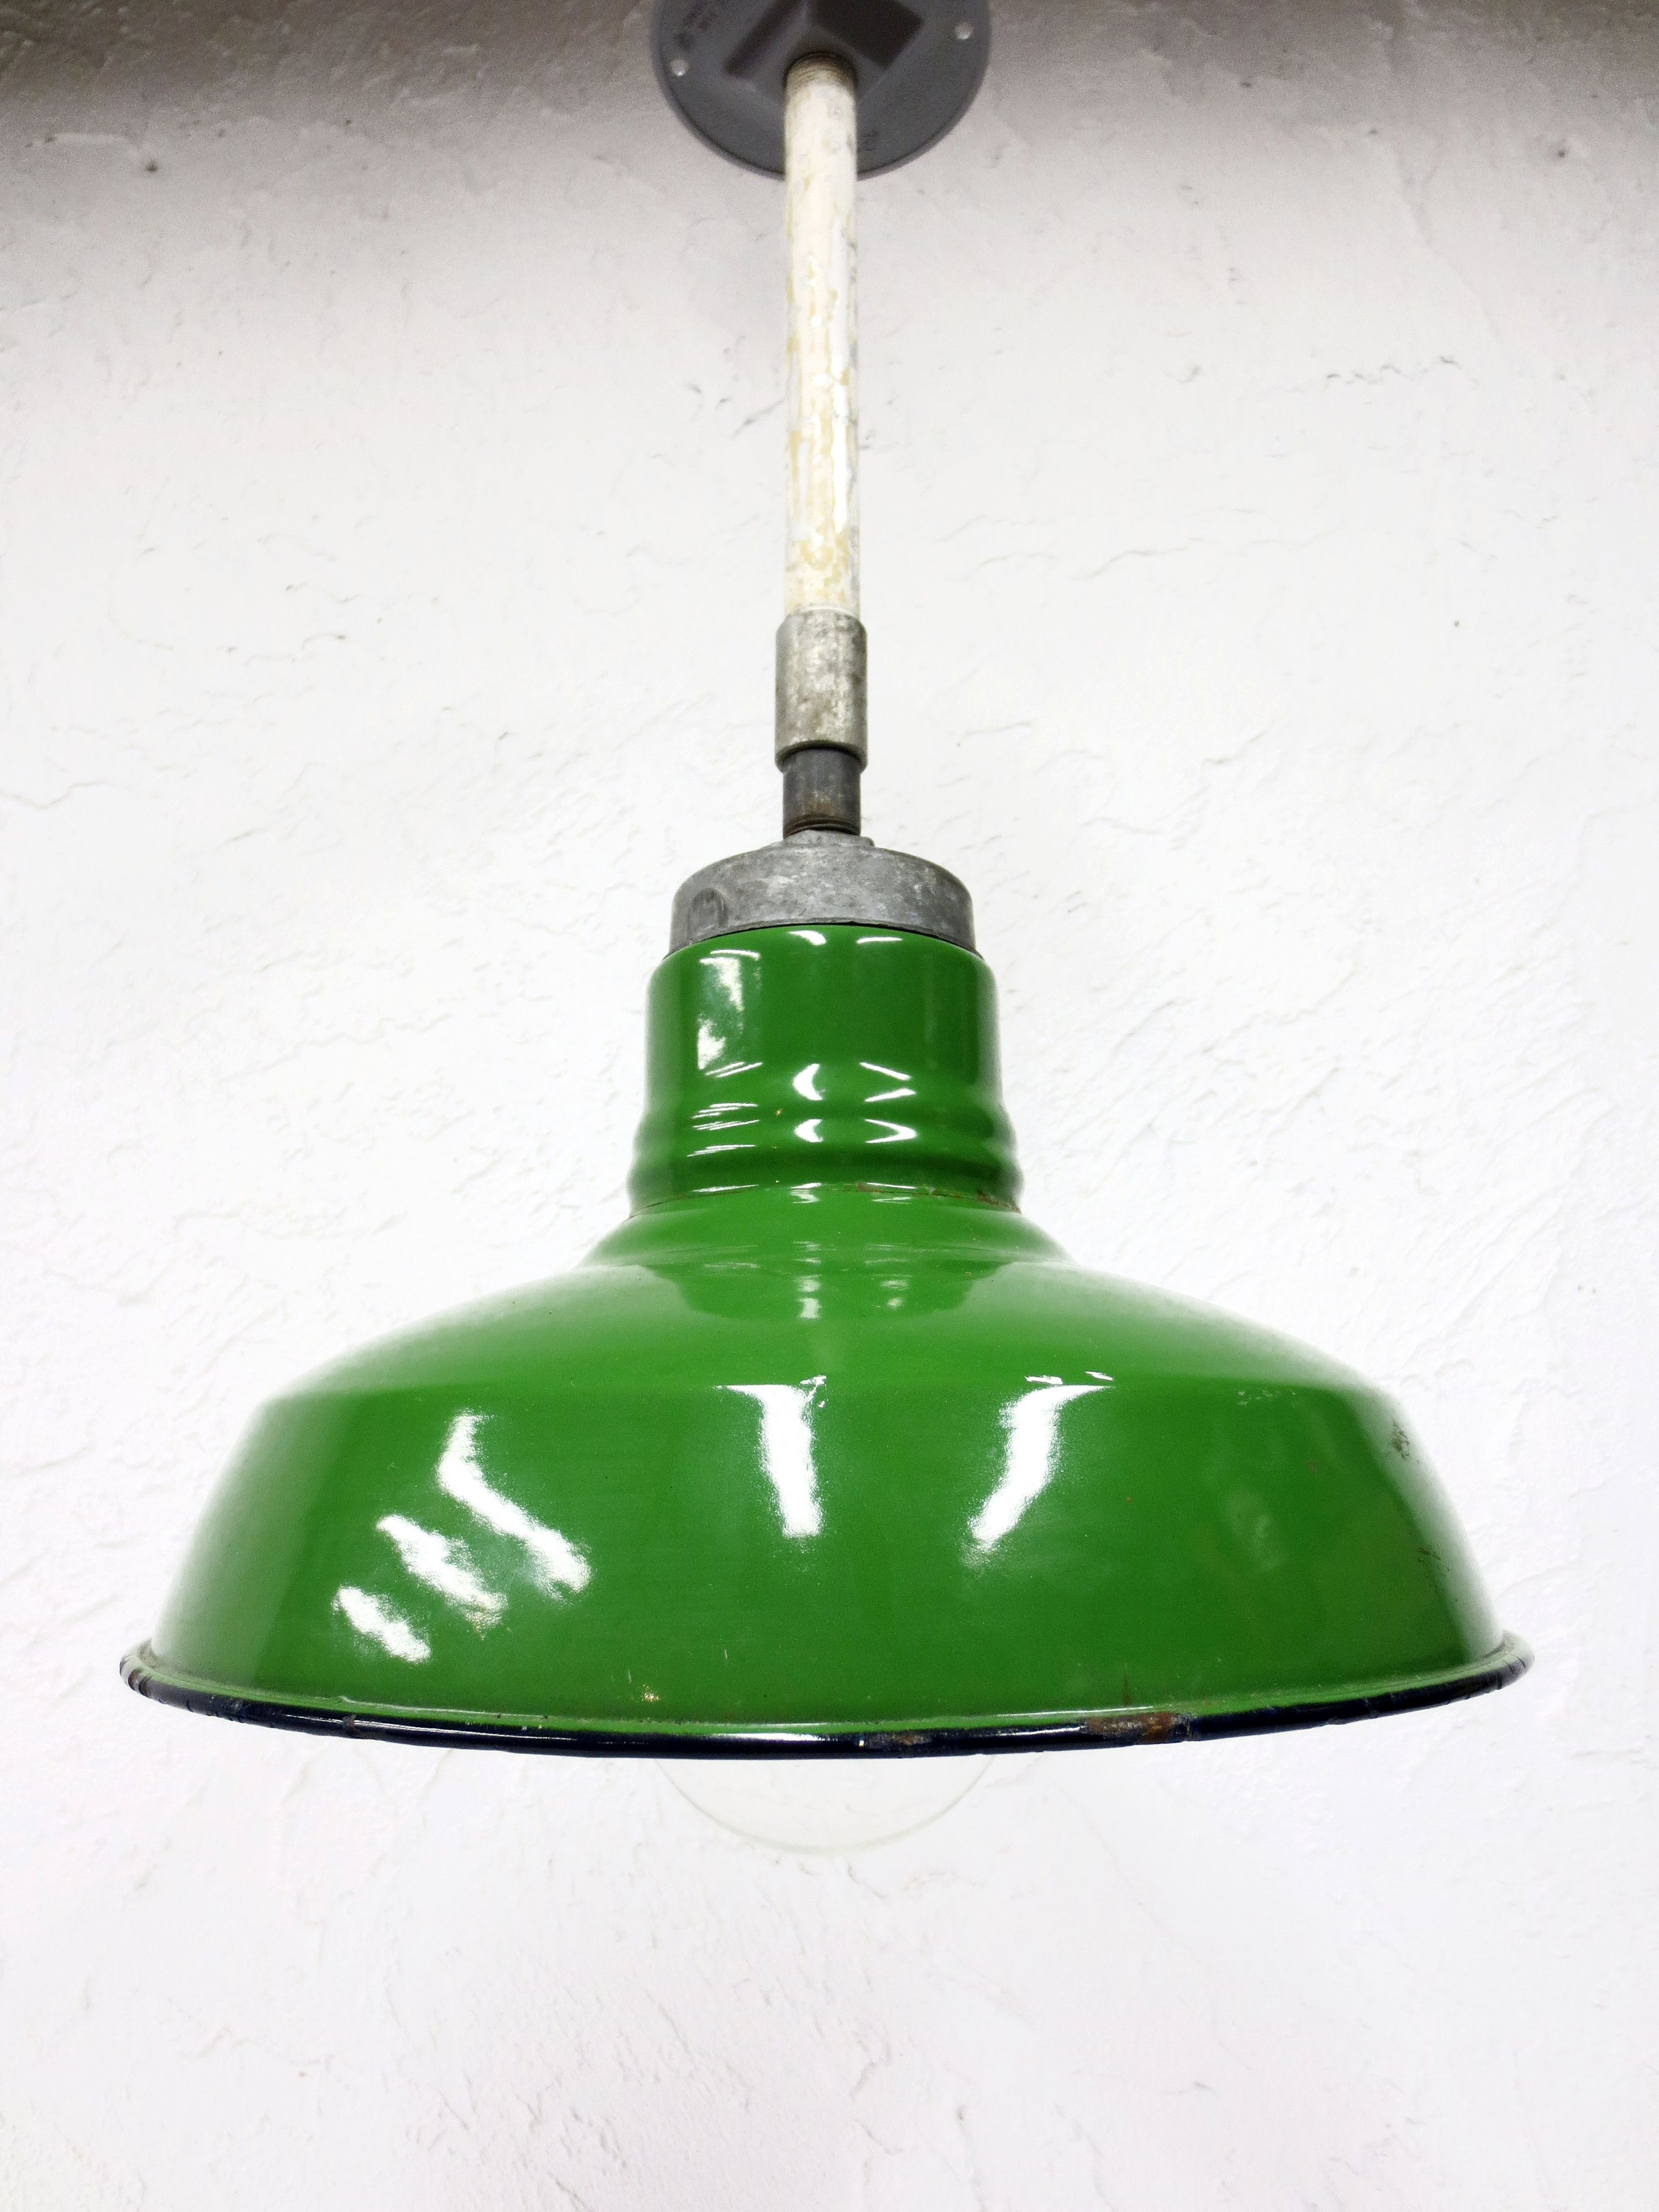 Vintage Wheeler Porcelain Enamel Light Shade Fixture 12 Dia